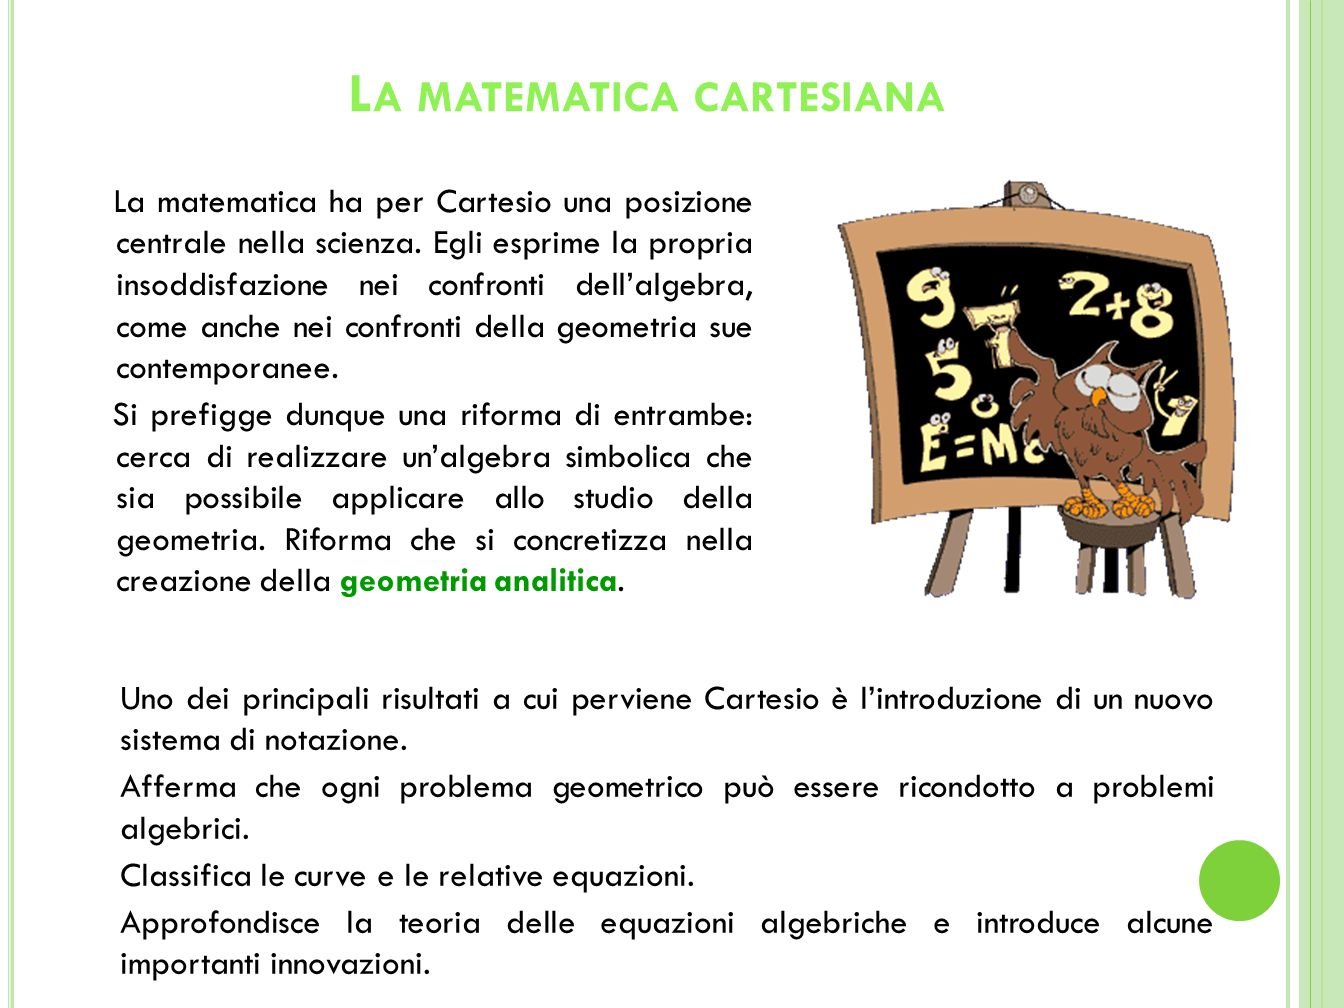 La matematica cartesiana